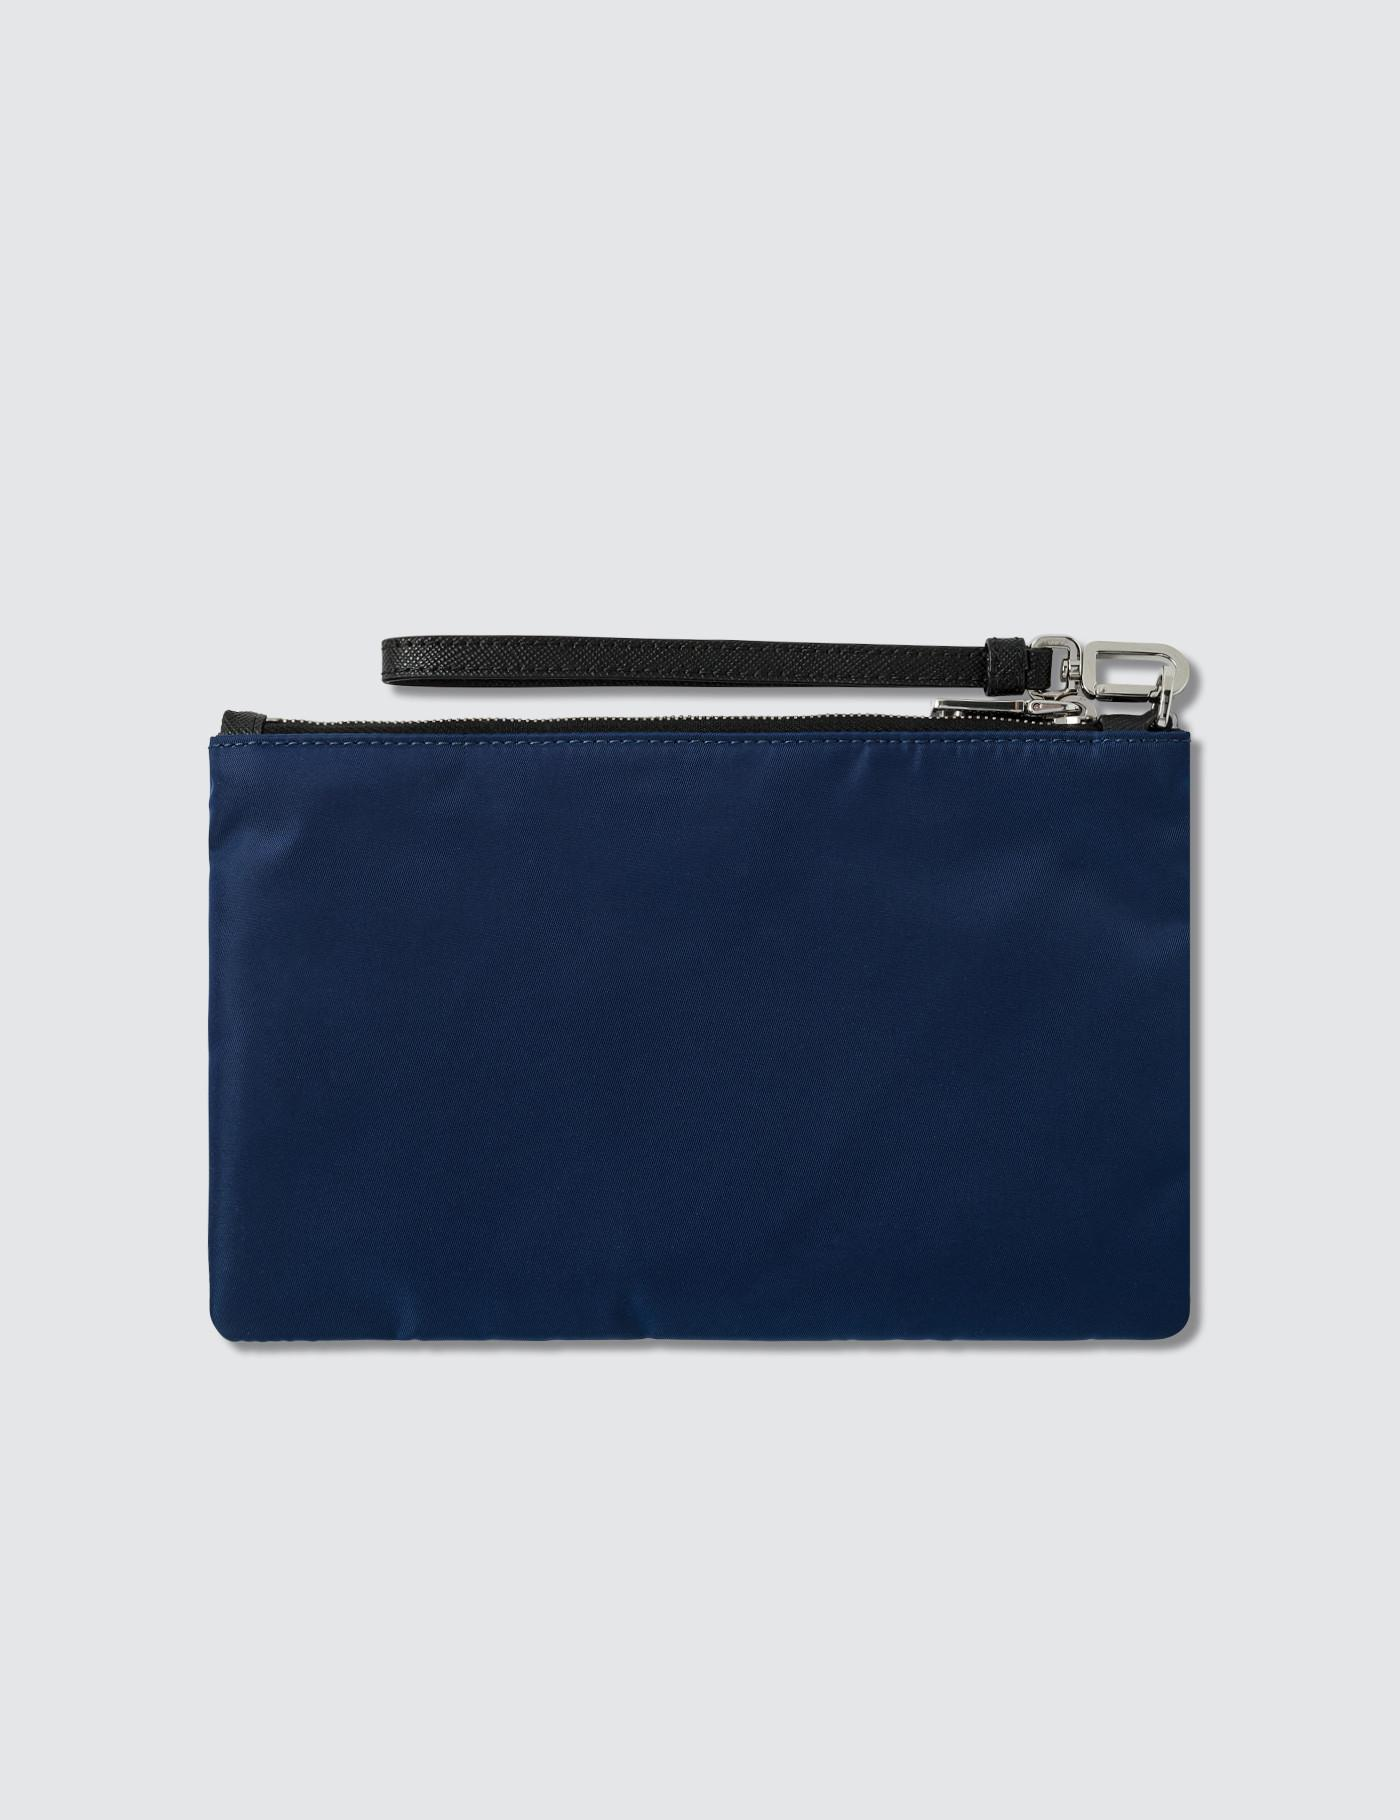 Lyst - Prada Logo Small Pouch in Blue for Men 5273ef8cfc968